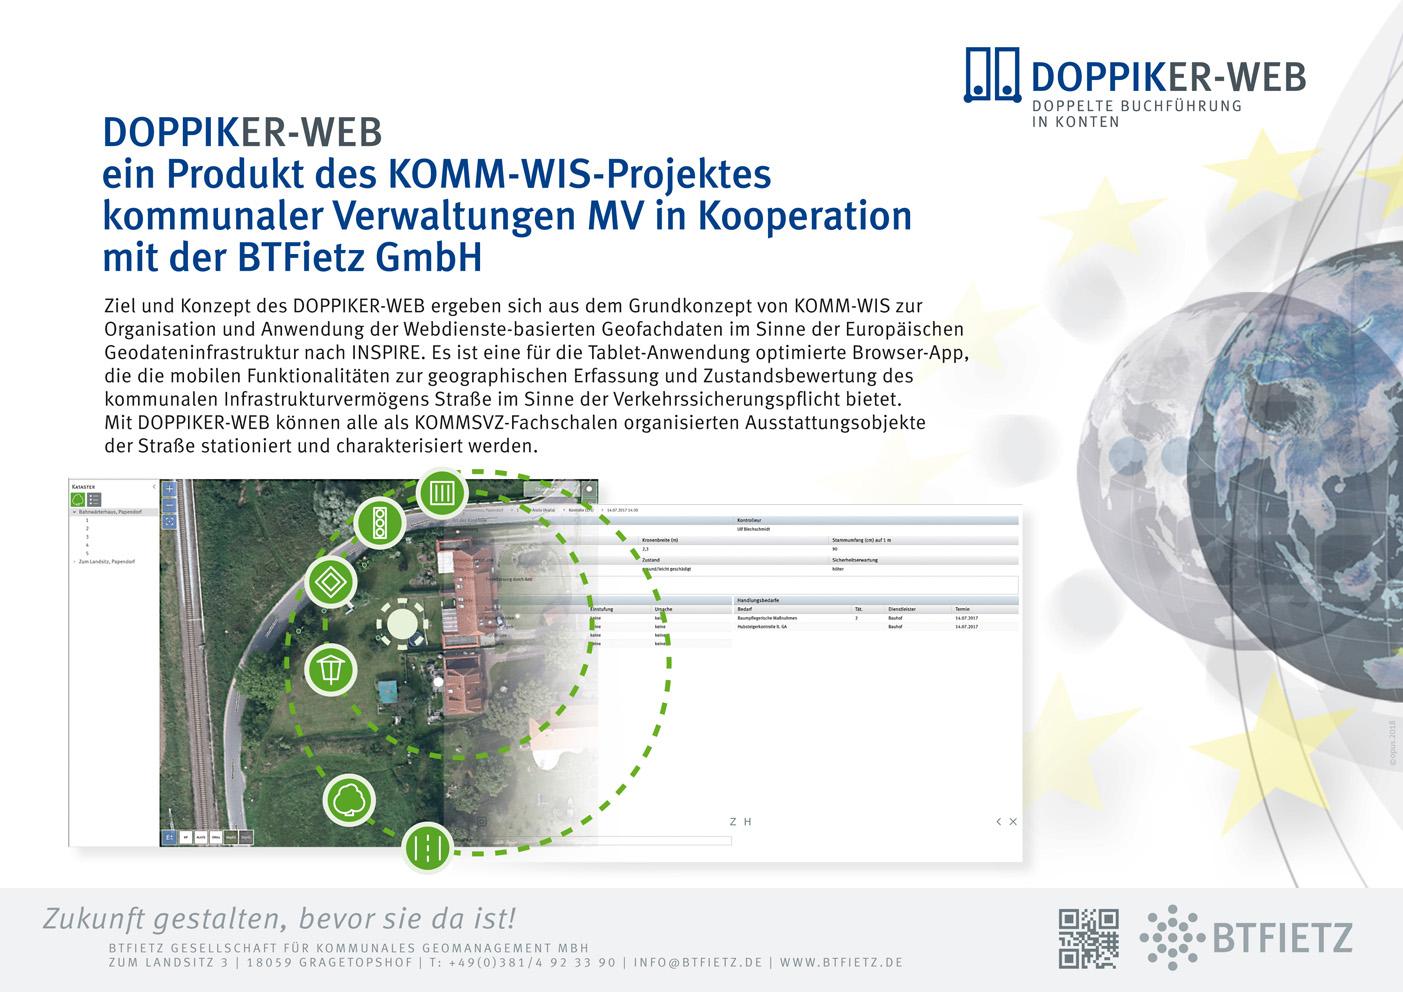 PB_DOPPIKER-WEB_P_www_kl.jpg